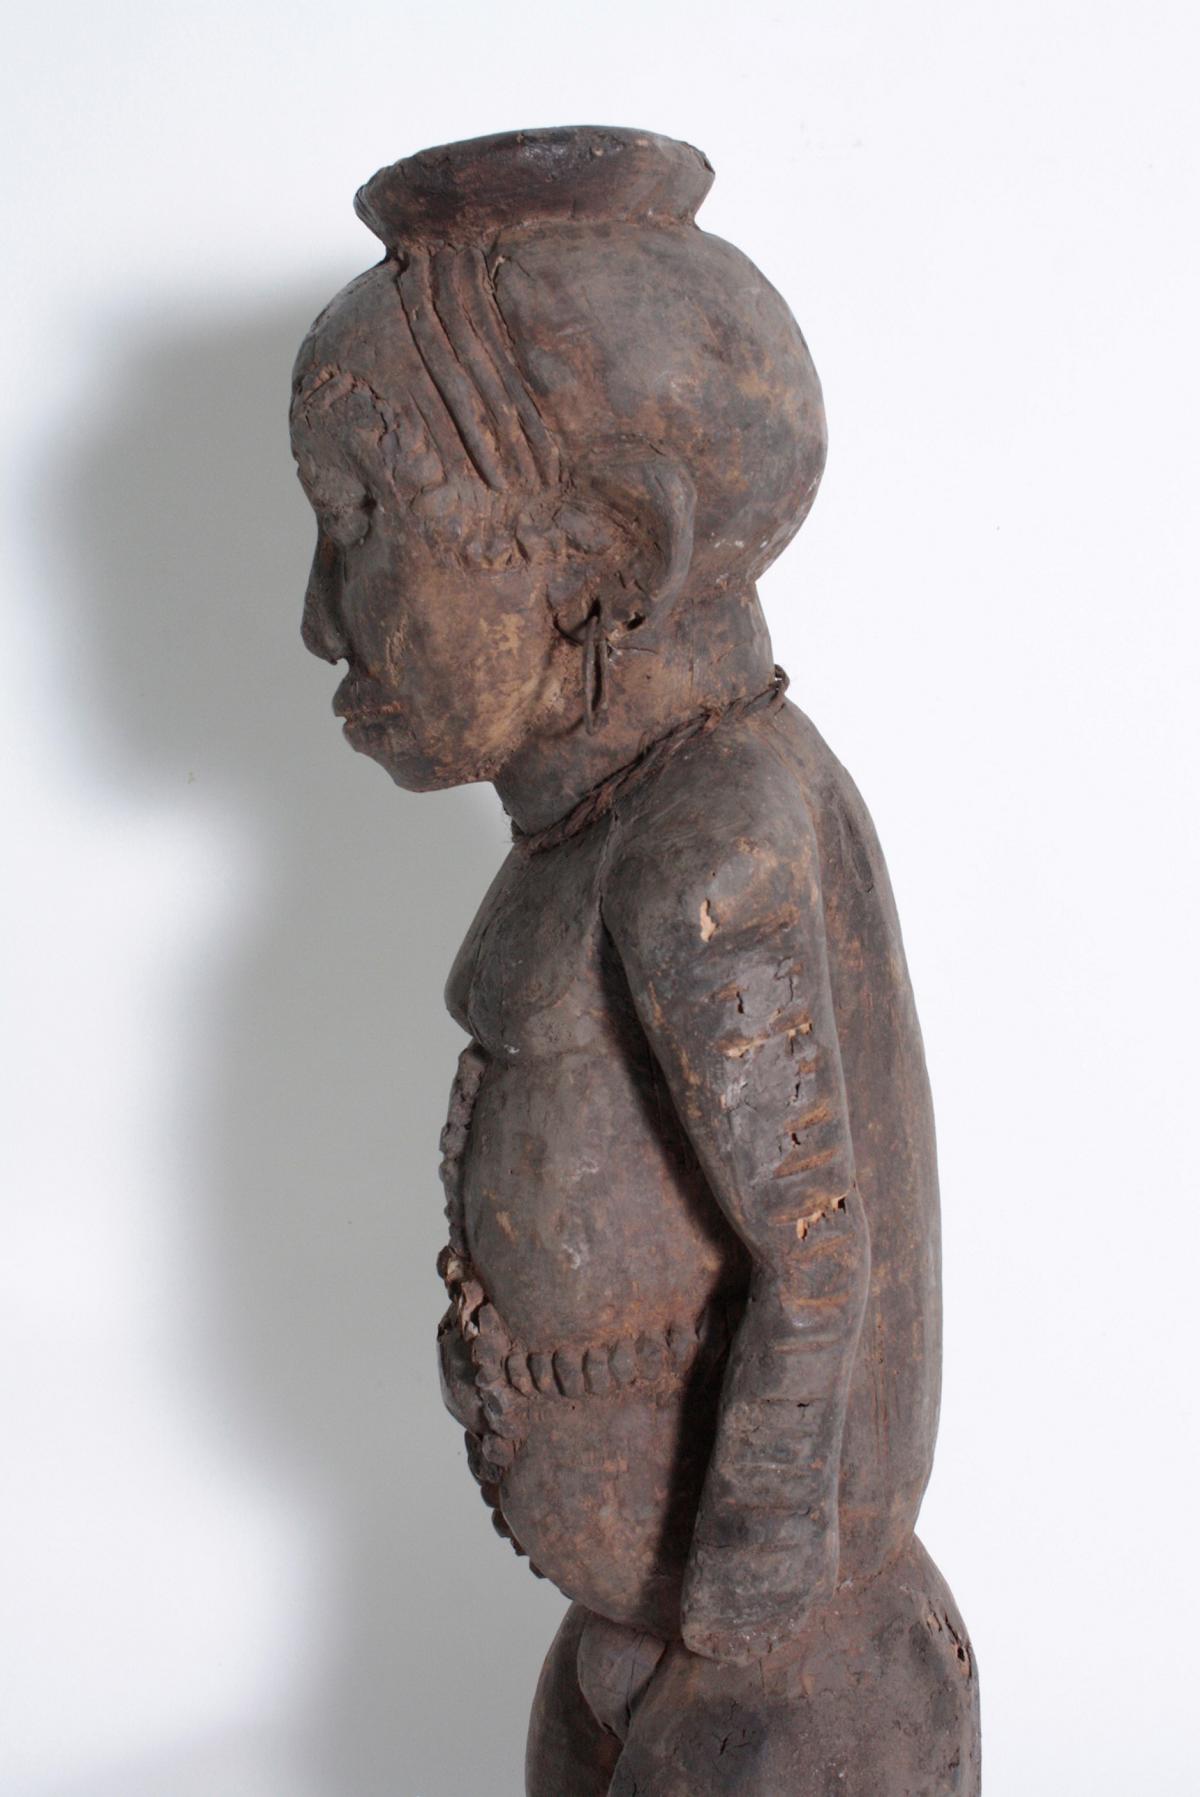 Ältere Ahnen-Figur, Tabwa, D. R. Kongo-5